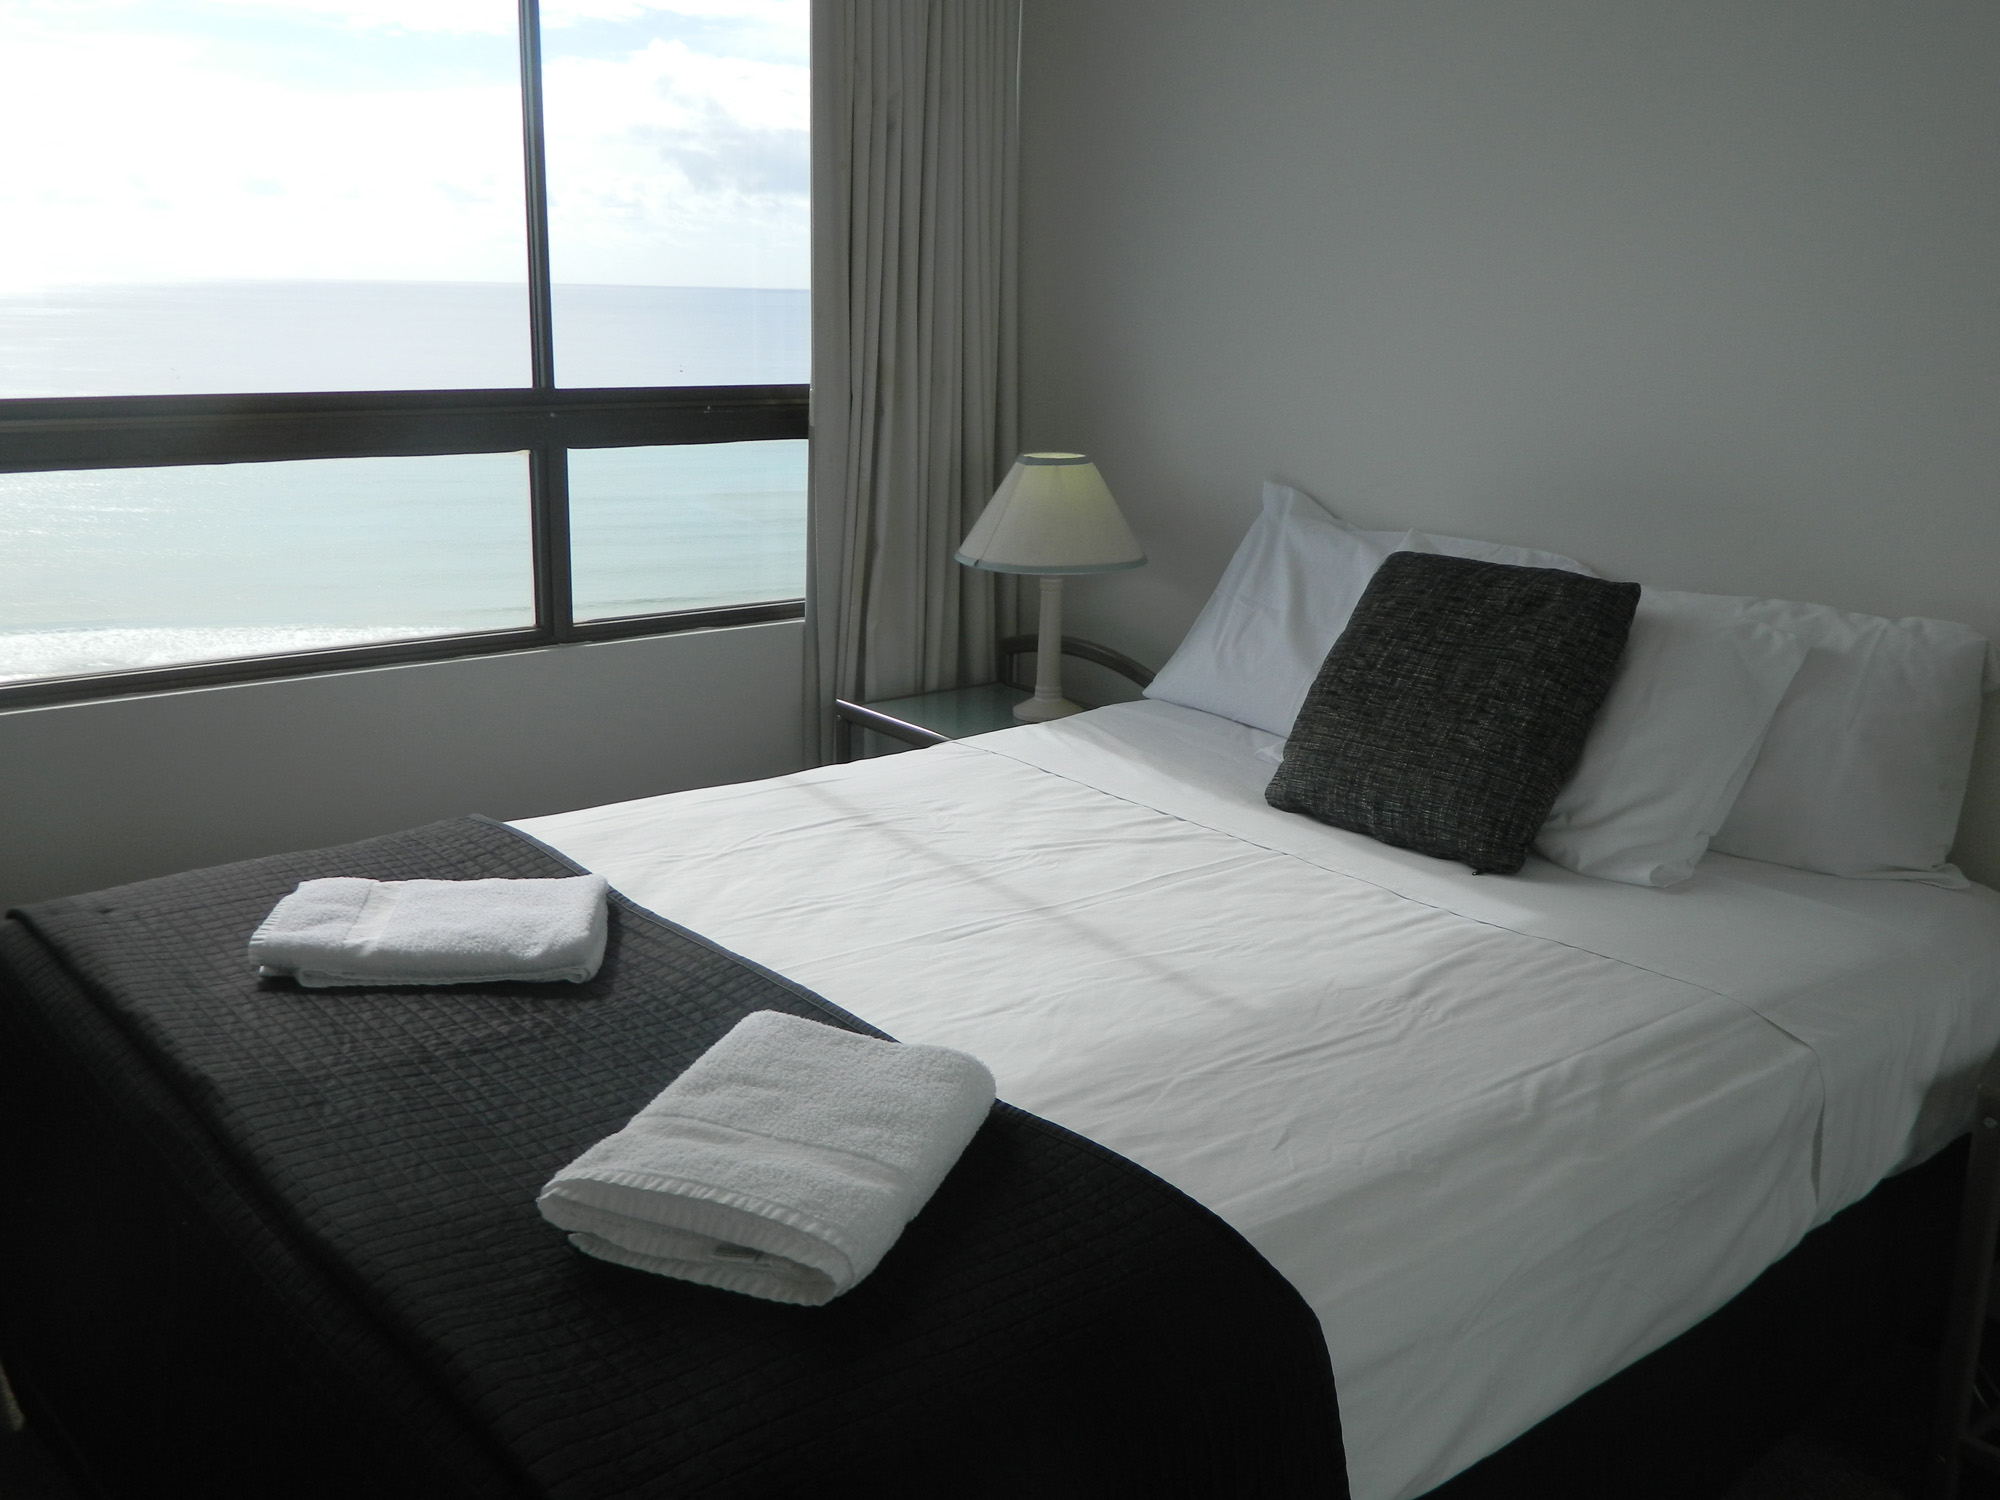 Royal Palm Resort Palm Beach Accommodation Bedroom